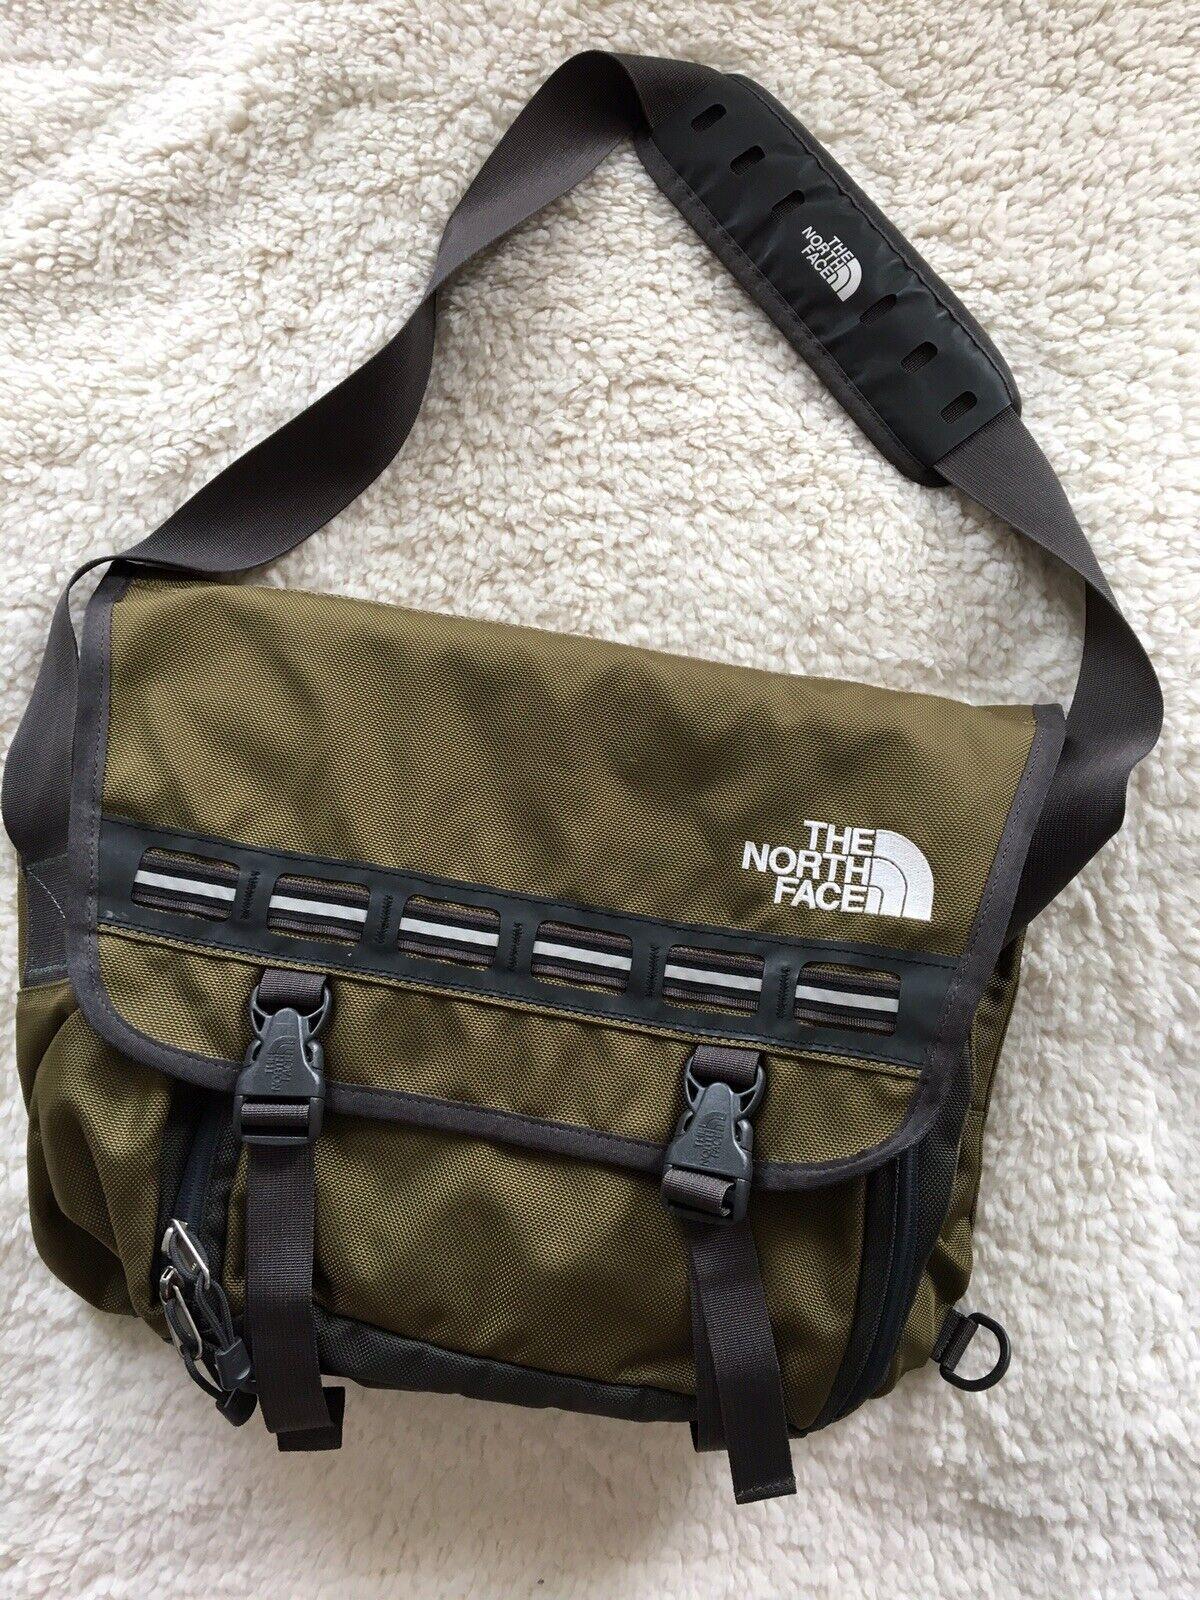 THE NORTH FACE Men's Travel Hiking Shoulder Bag Coloree Khaki Sz Large